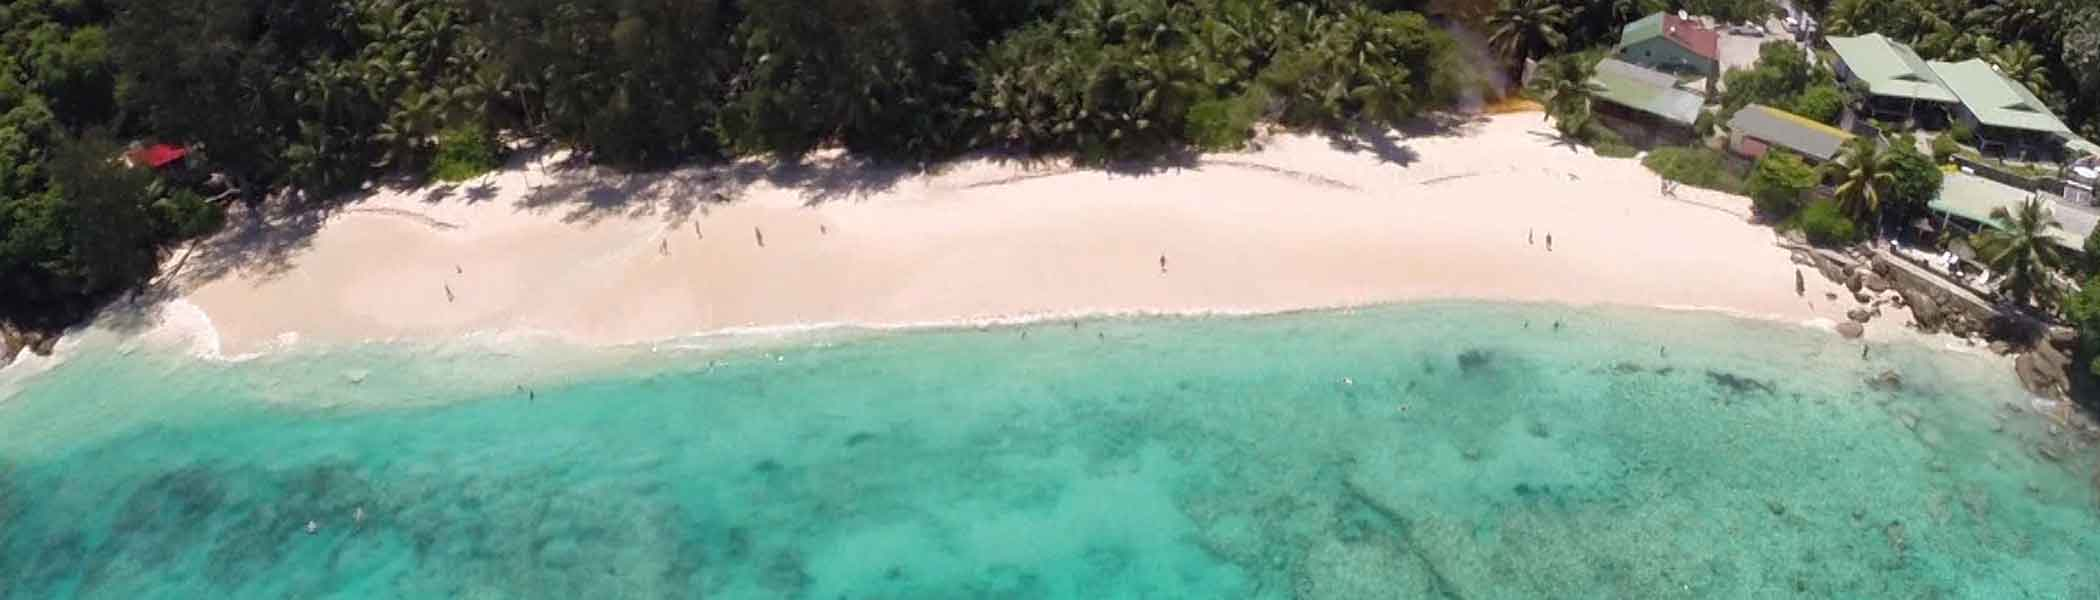 anse-soleil, Beaches in Seychelles Islands